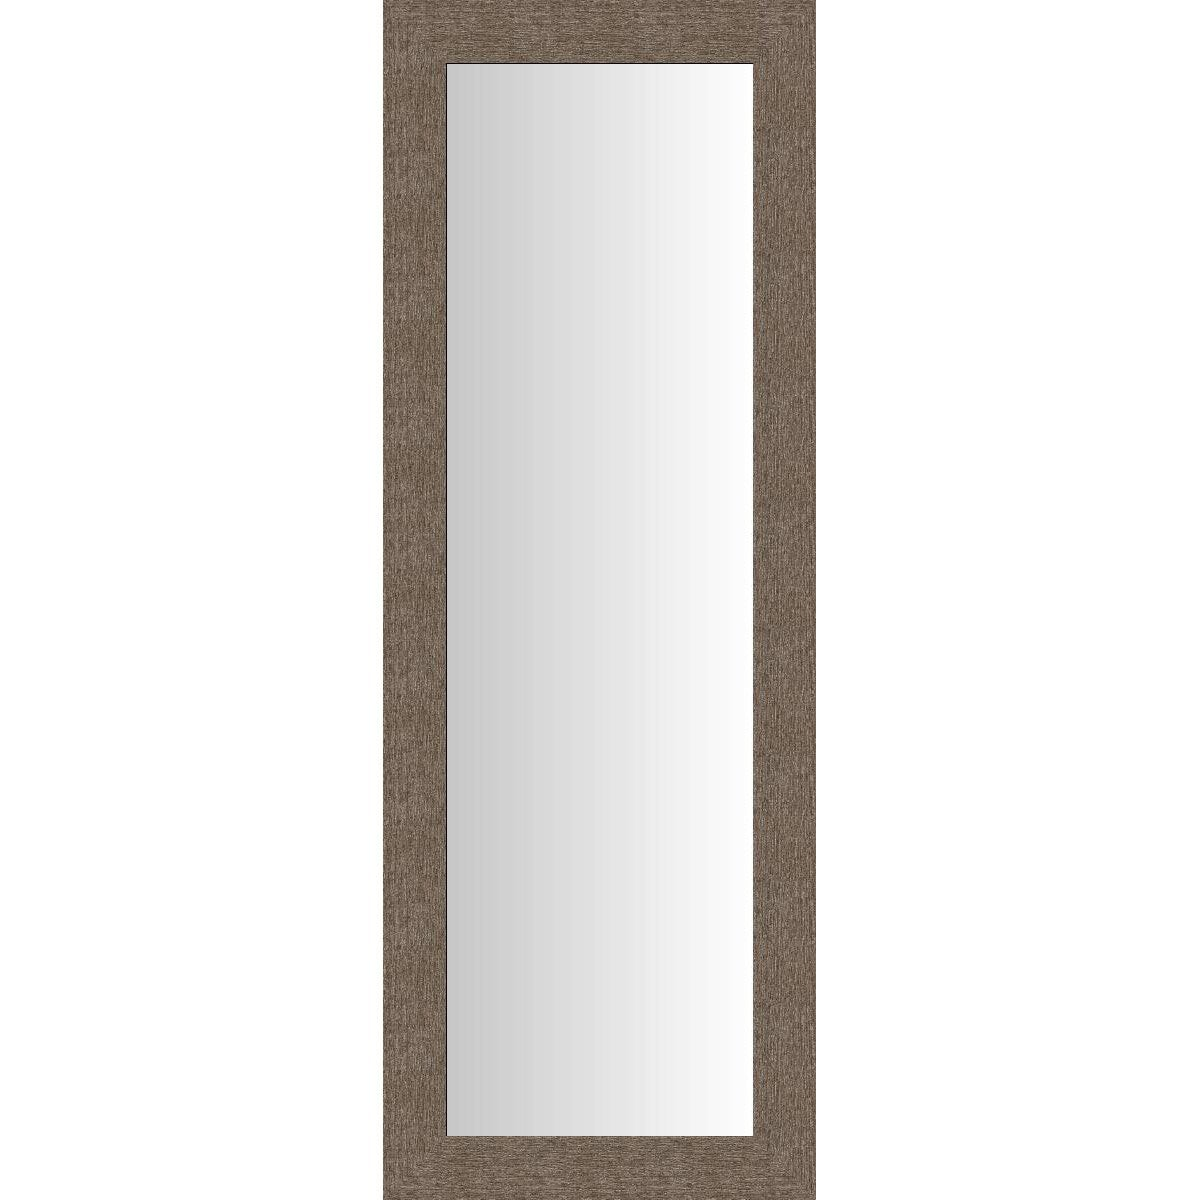 Miroir dublin brun 40x140 cm leroy merlin for Miroir autocollant leroy merlin